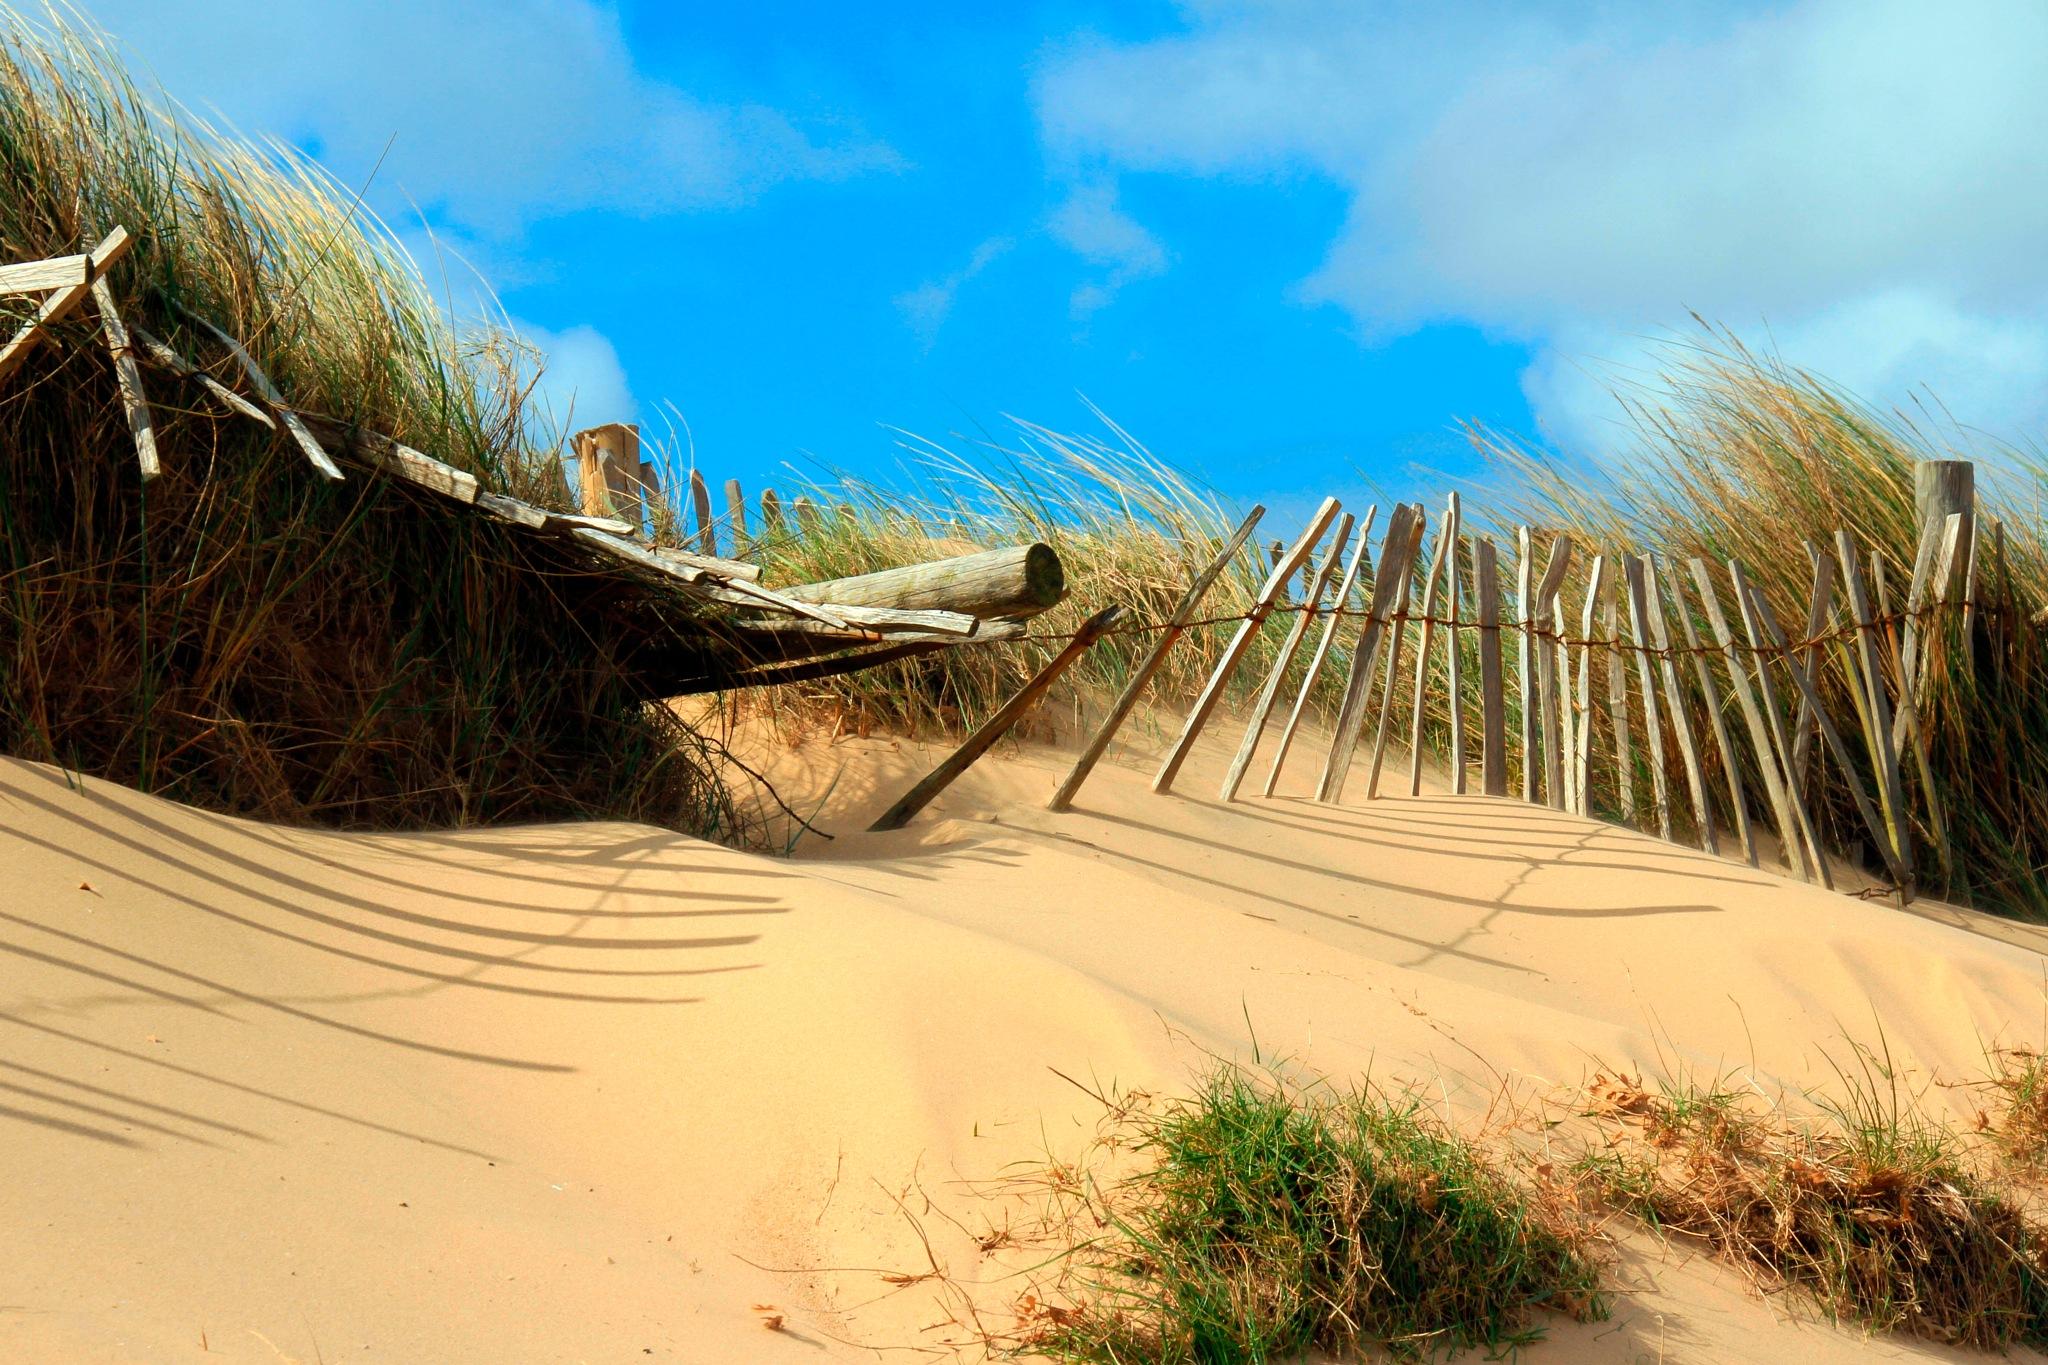 Dunes in Norfolk by Martin Roper